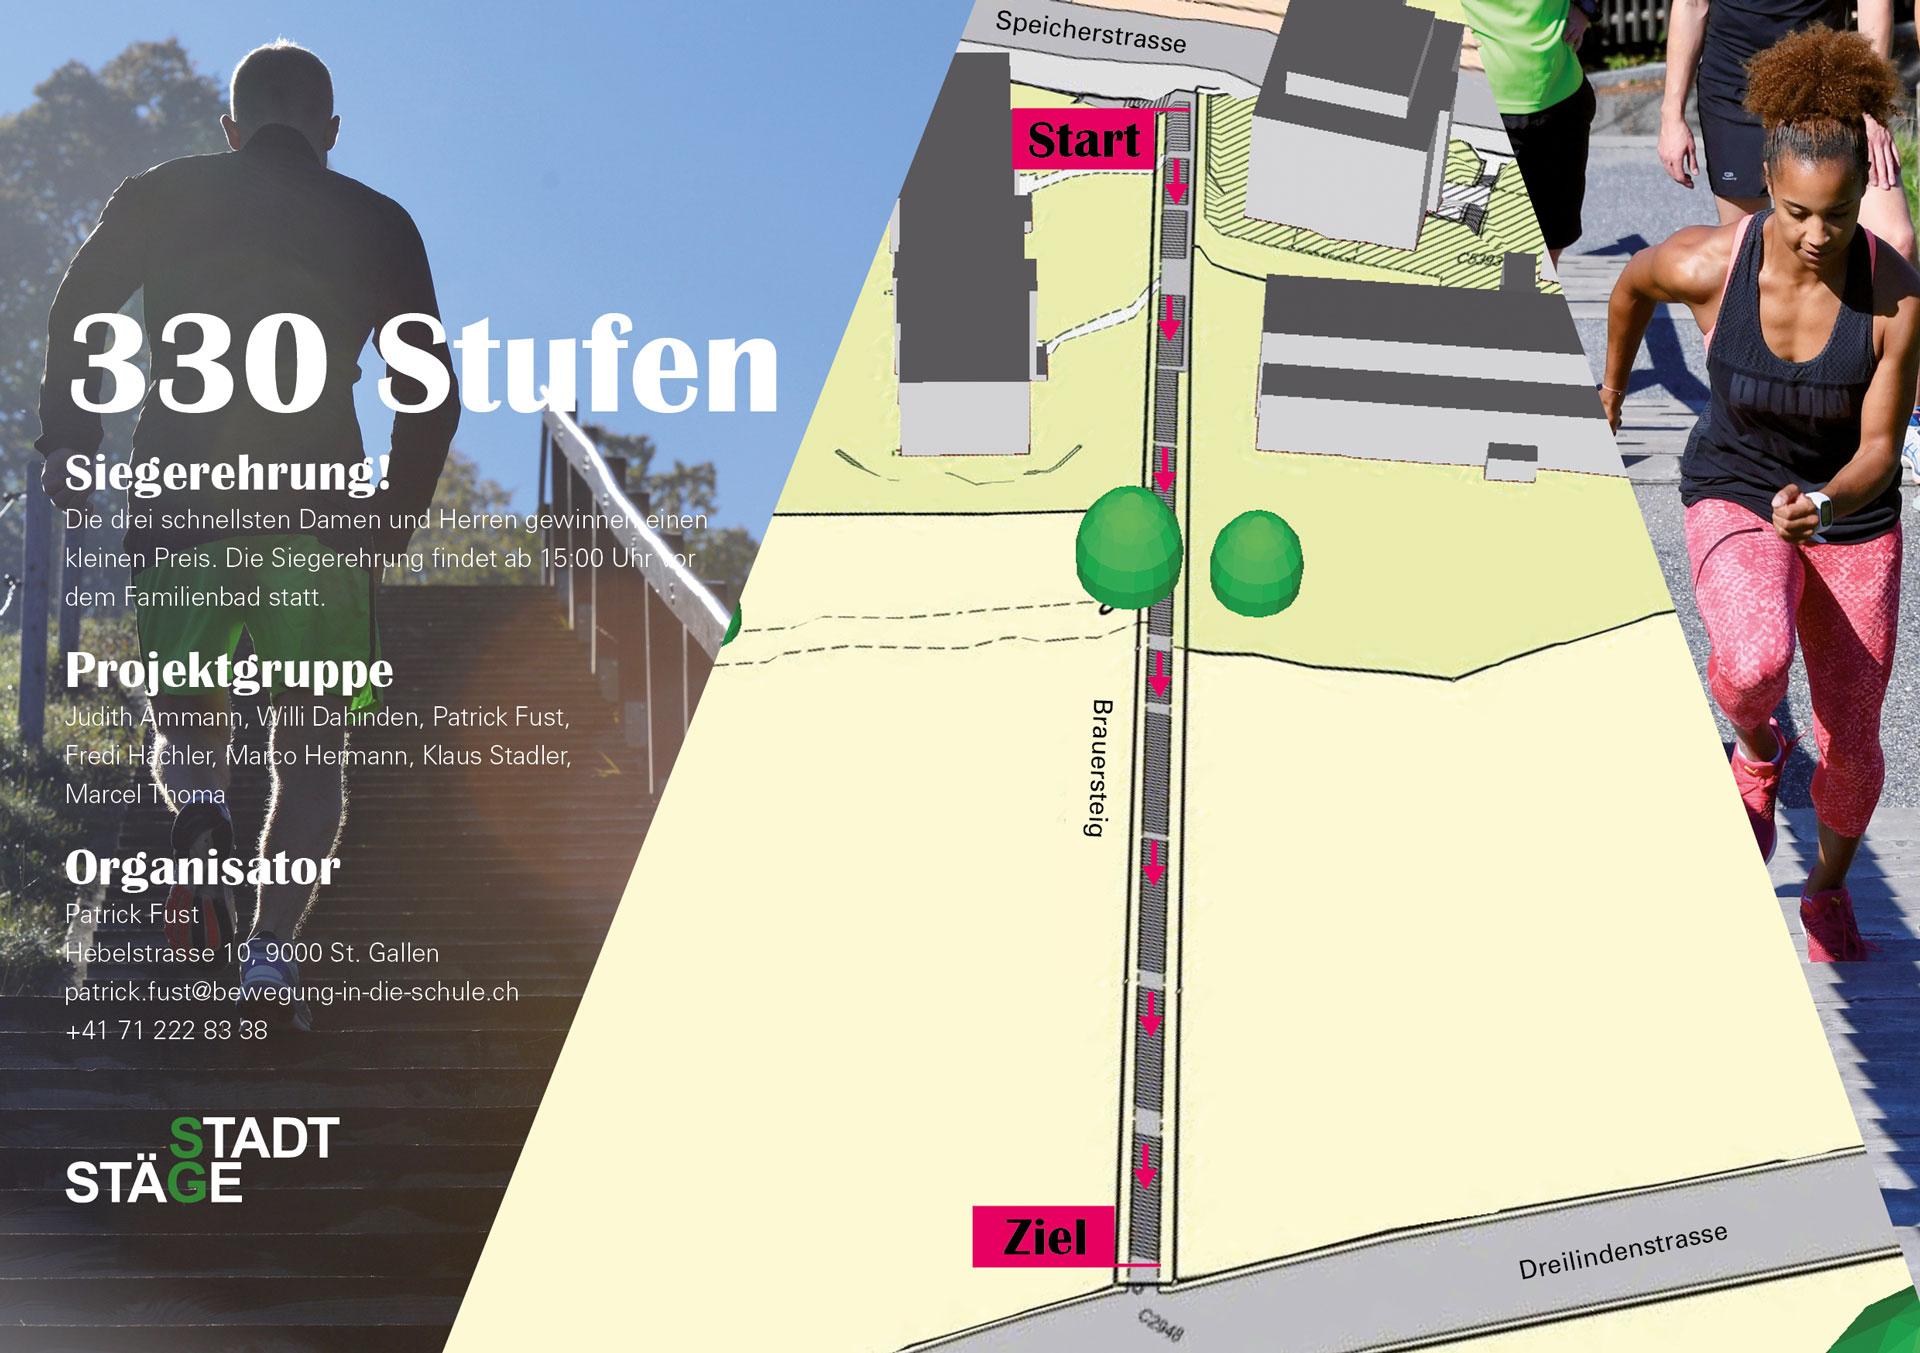 SG_Staegestadt_Flyer_RS.jpg